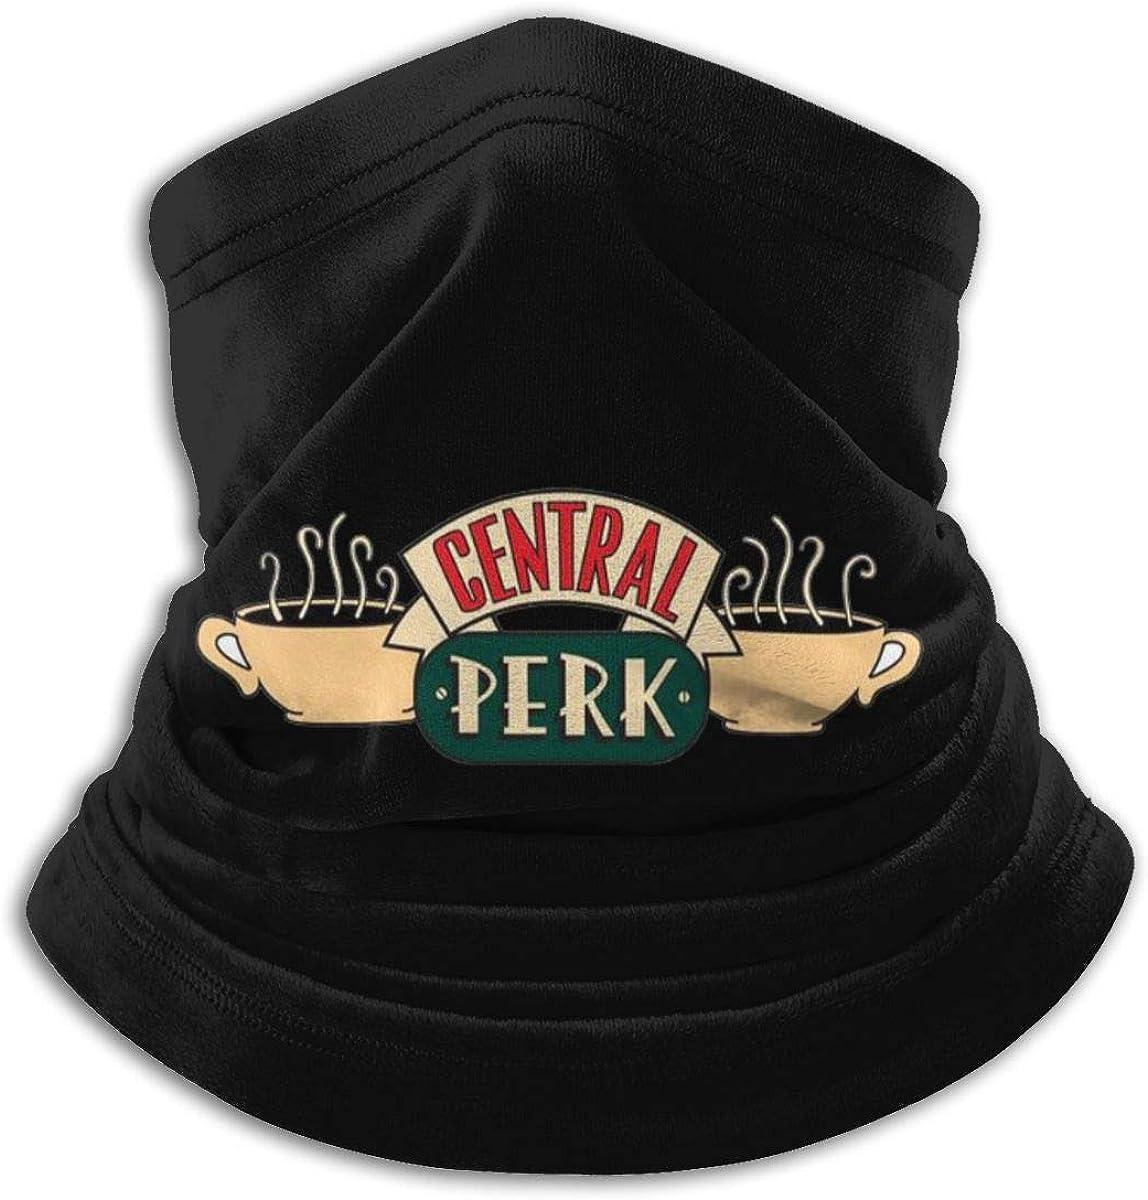 Central Perk Black Multi-function Neck Warmer Gaiter Polyester Neck Warmer Windproof Winter Neck Gaiter Cold Weather Scarf For Men Women